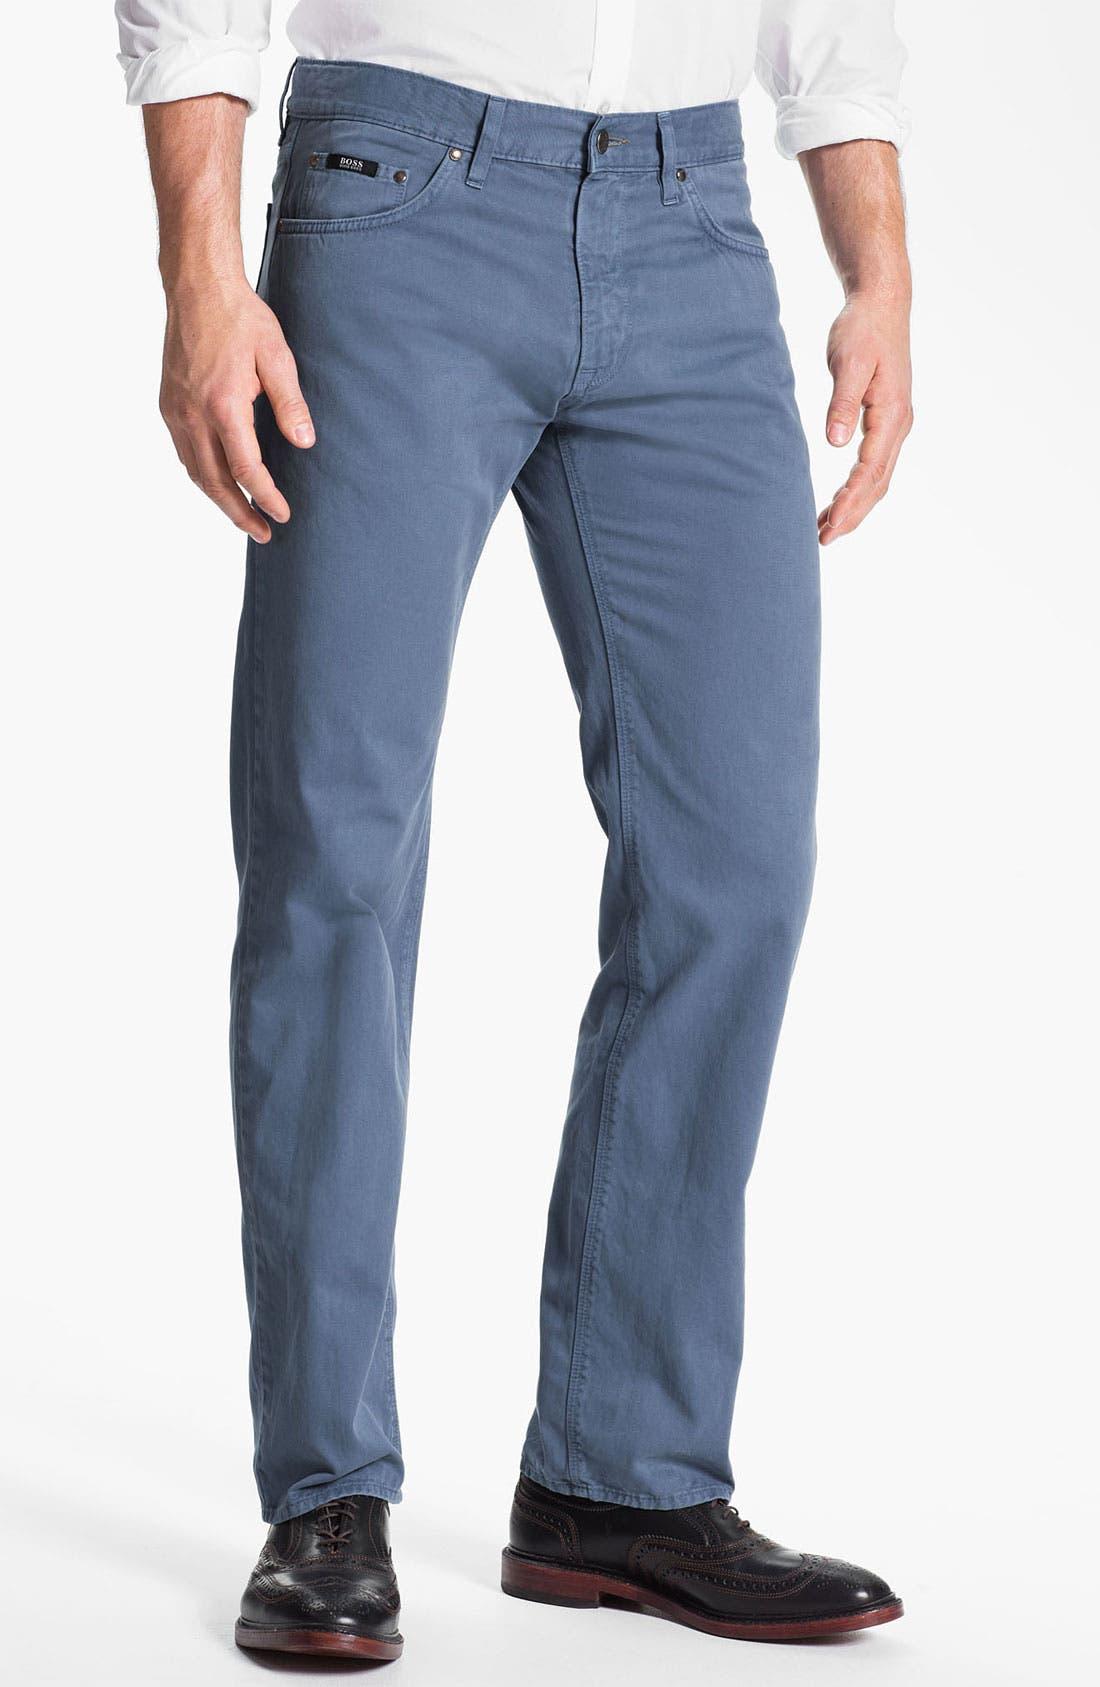 Alternate Image 1 Selected - BOSS HUGO BOSS 'Maine' Five Pocket Pants